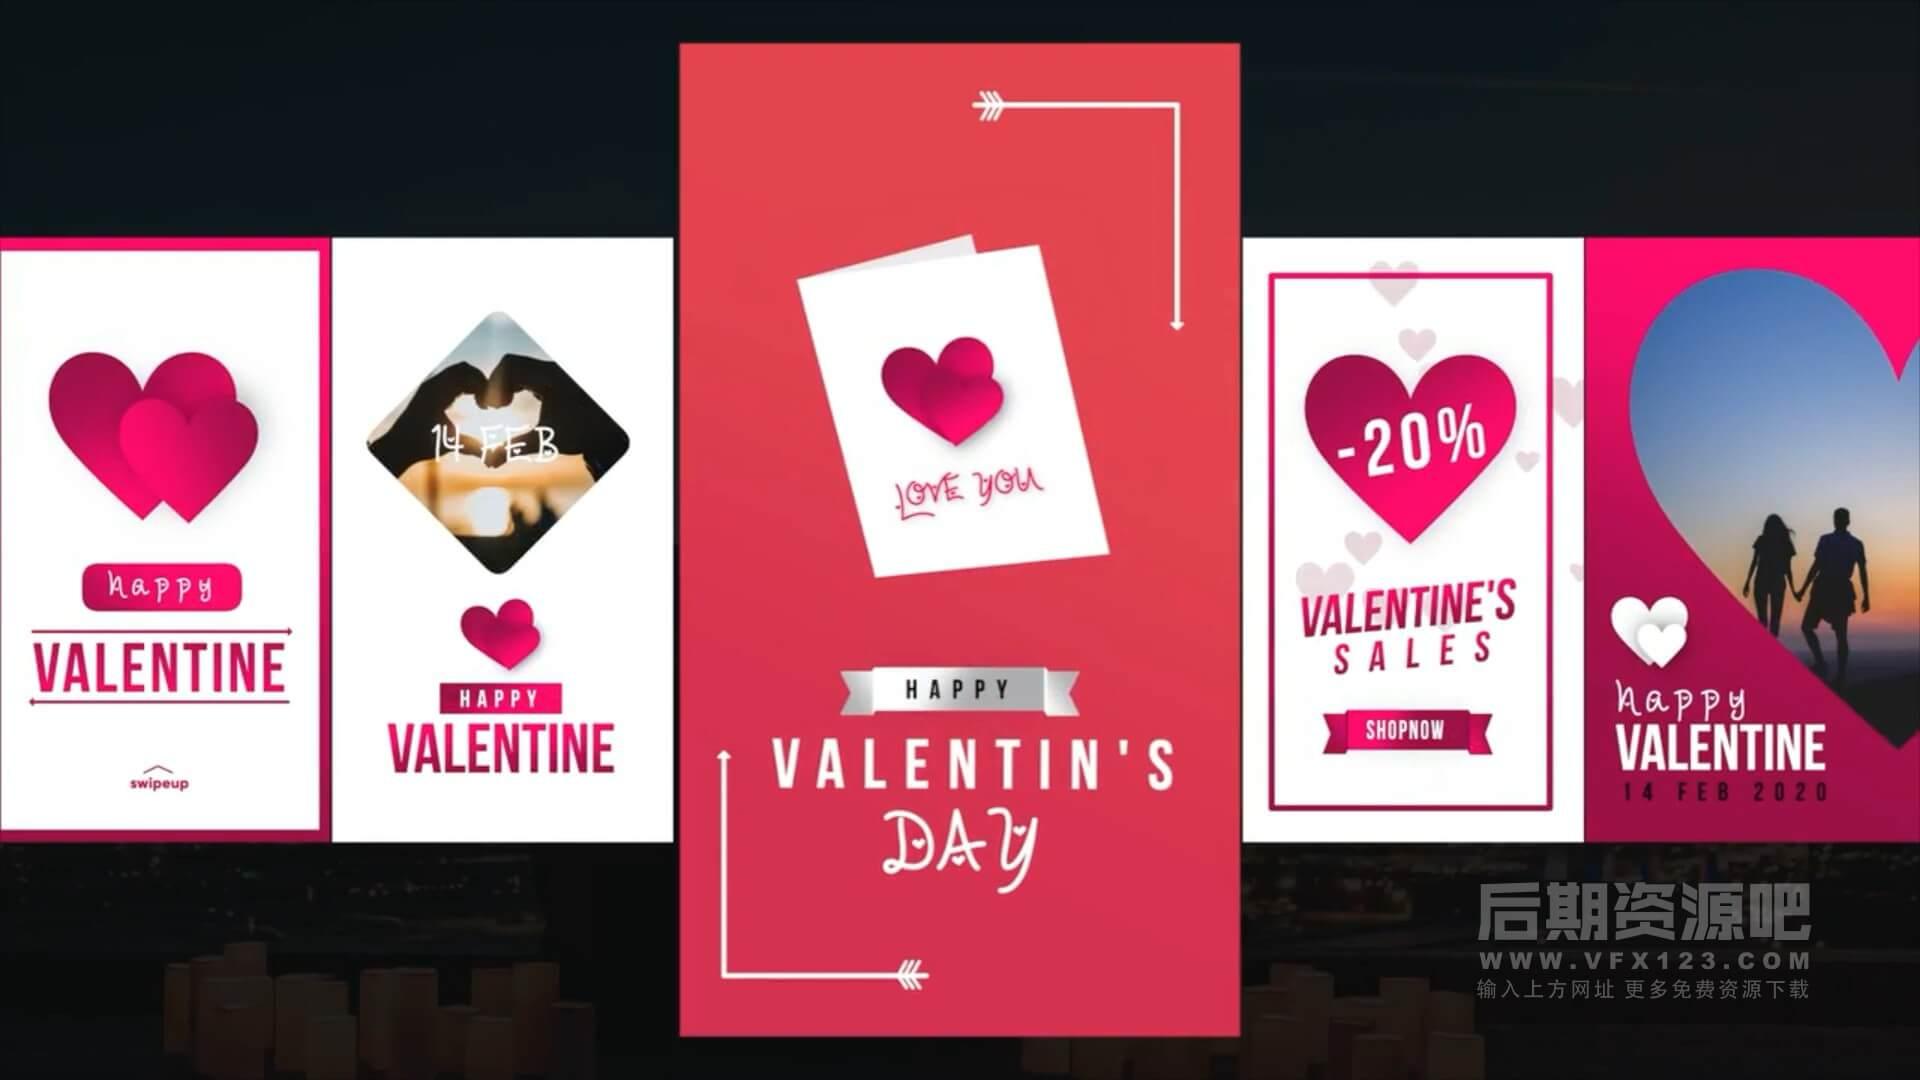 fcpx插件 婚礼爱情时尚竖屏手机短片片头模板 Valentine Stories